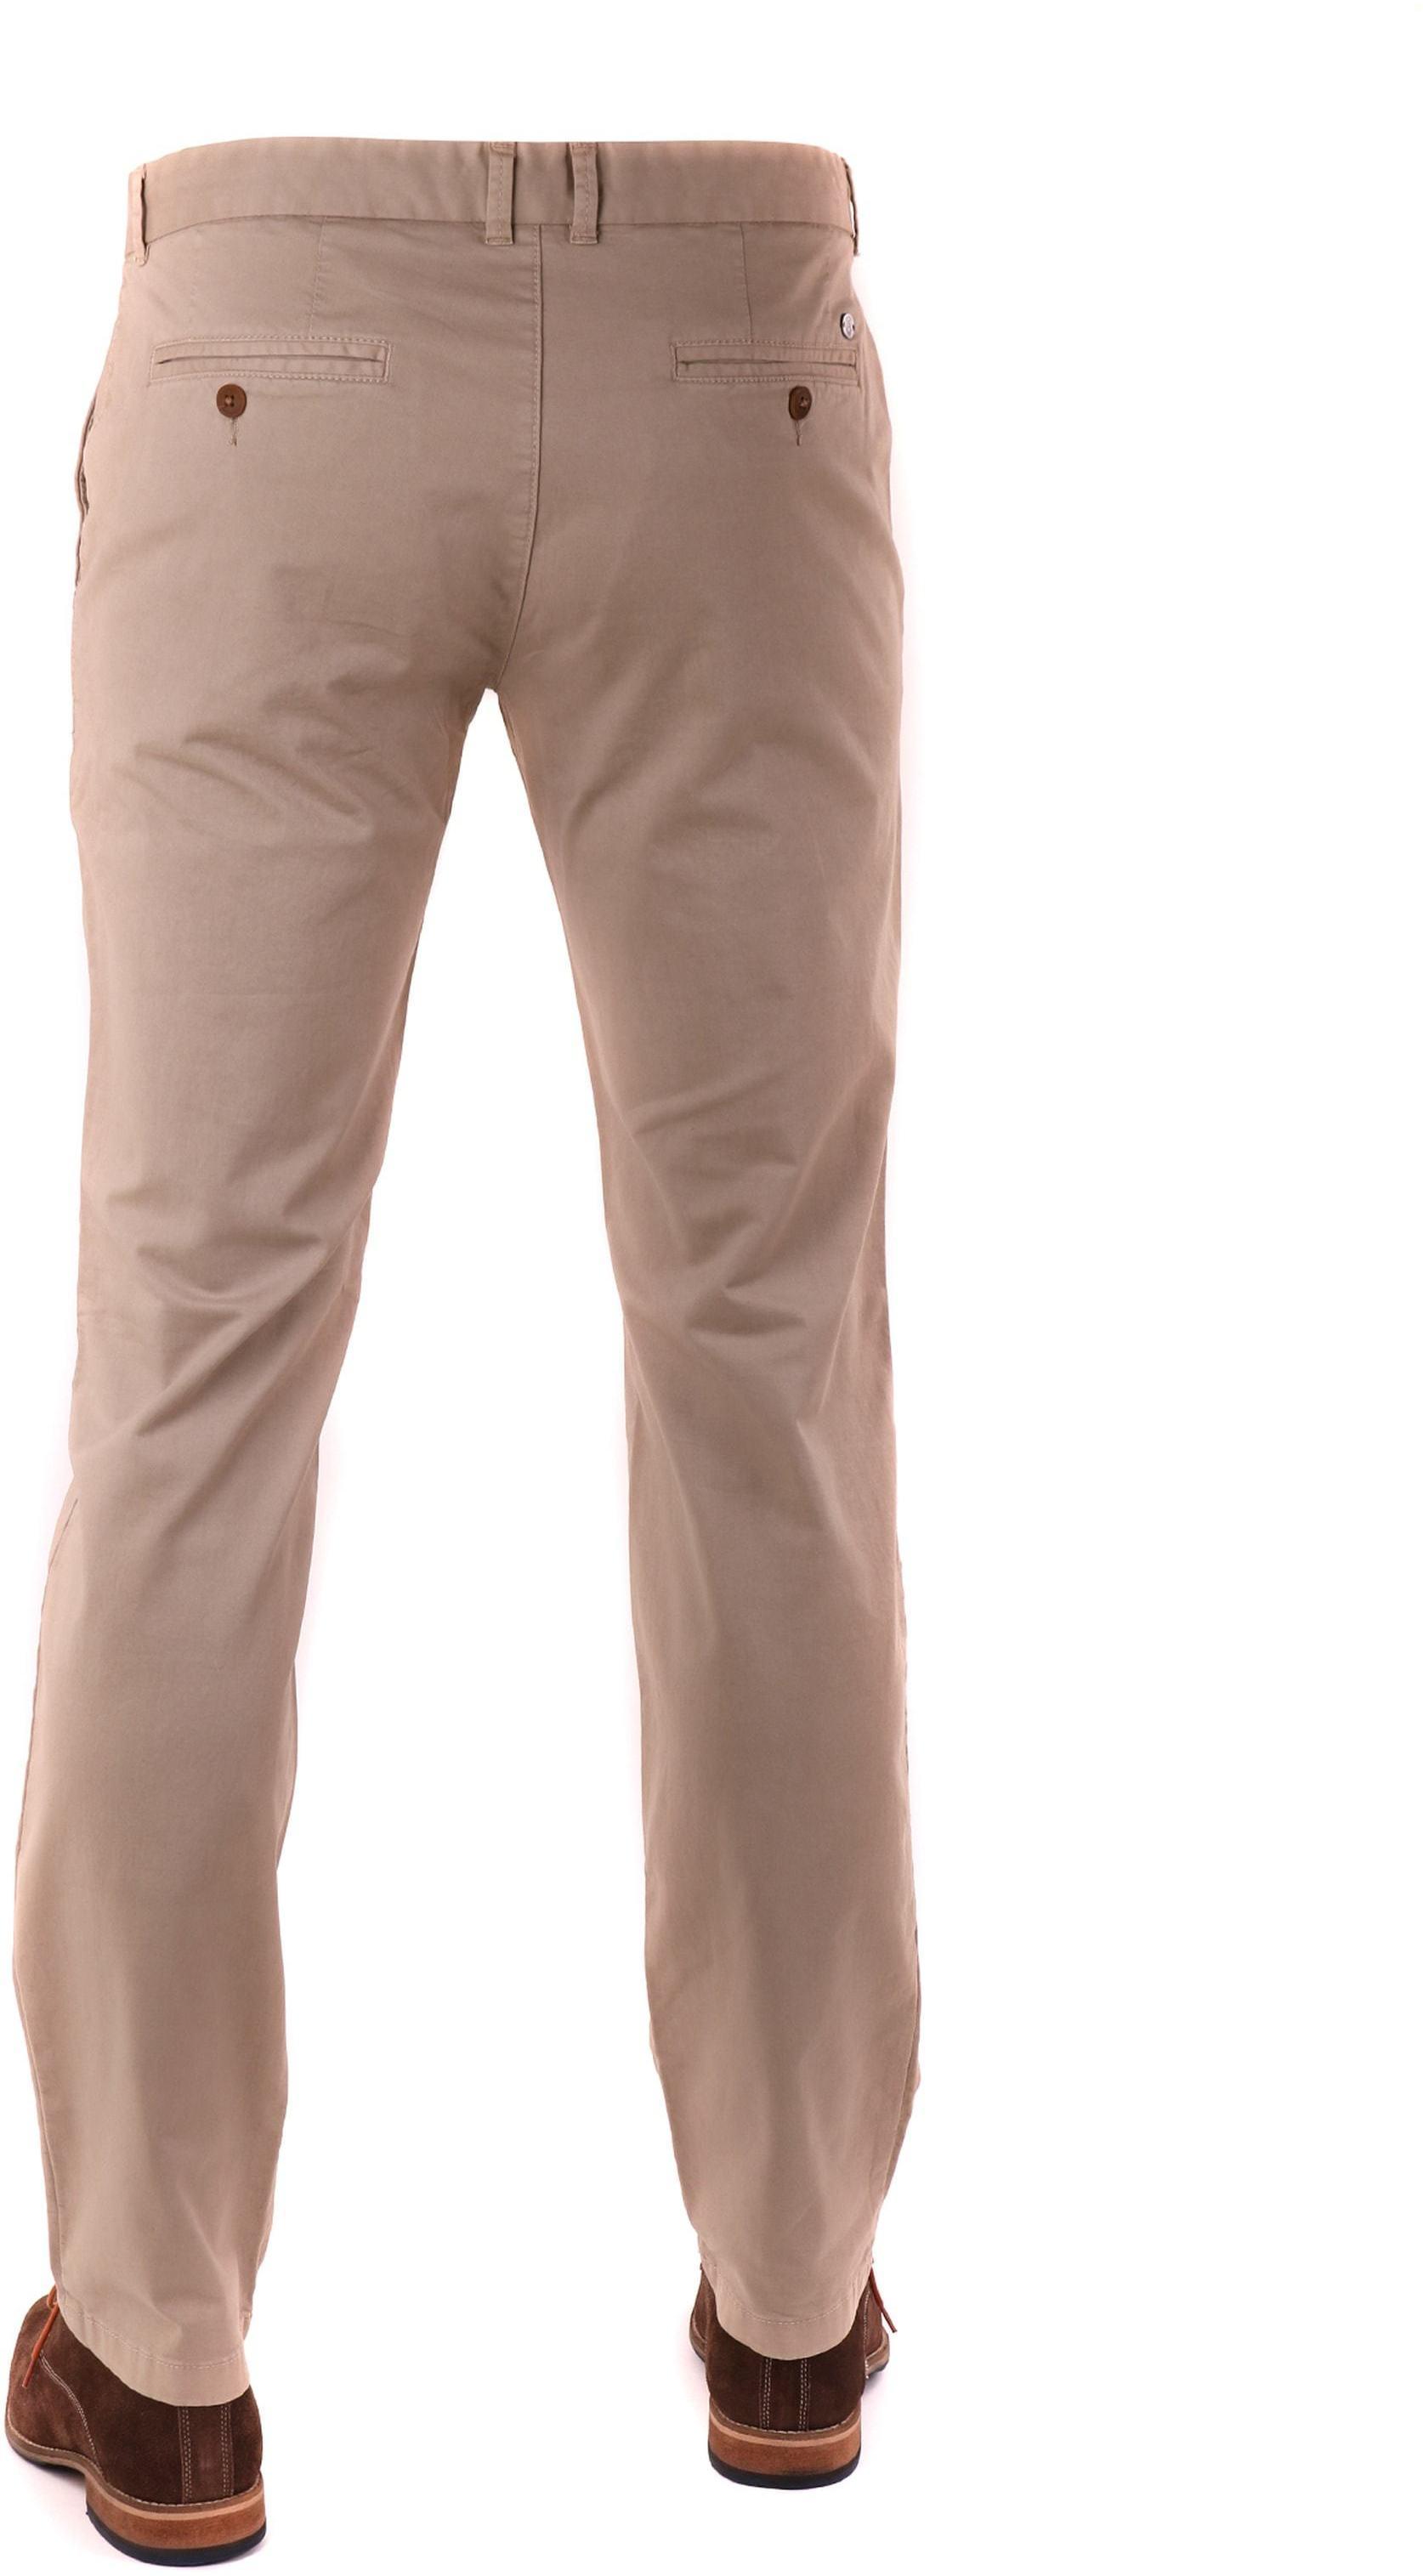 Suitable Chino Pants Khaki foto 1